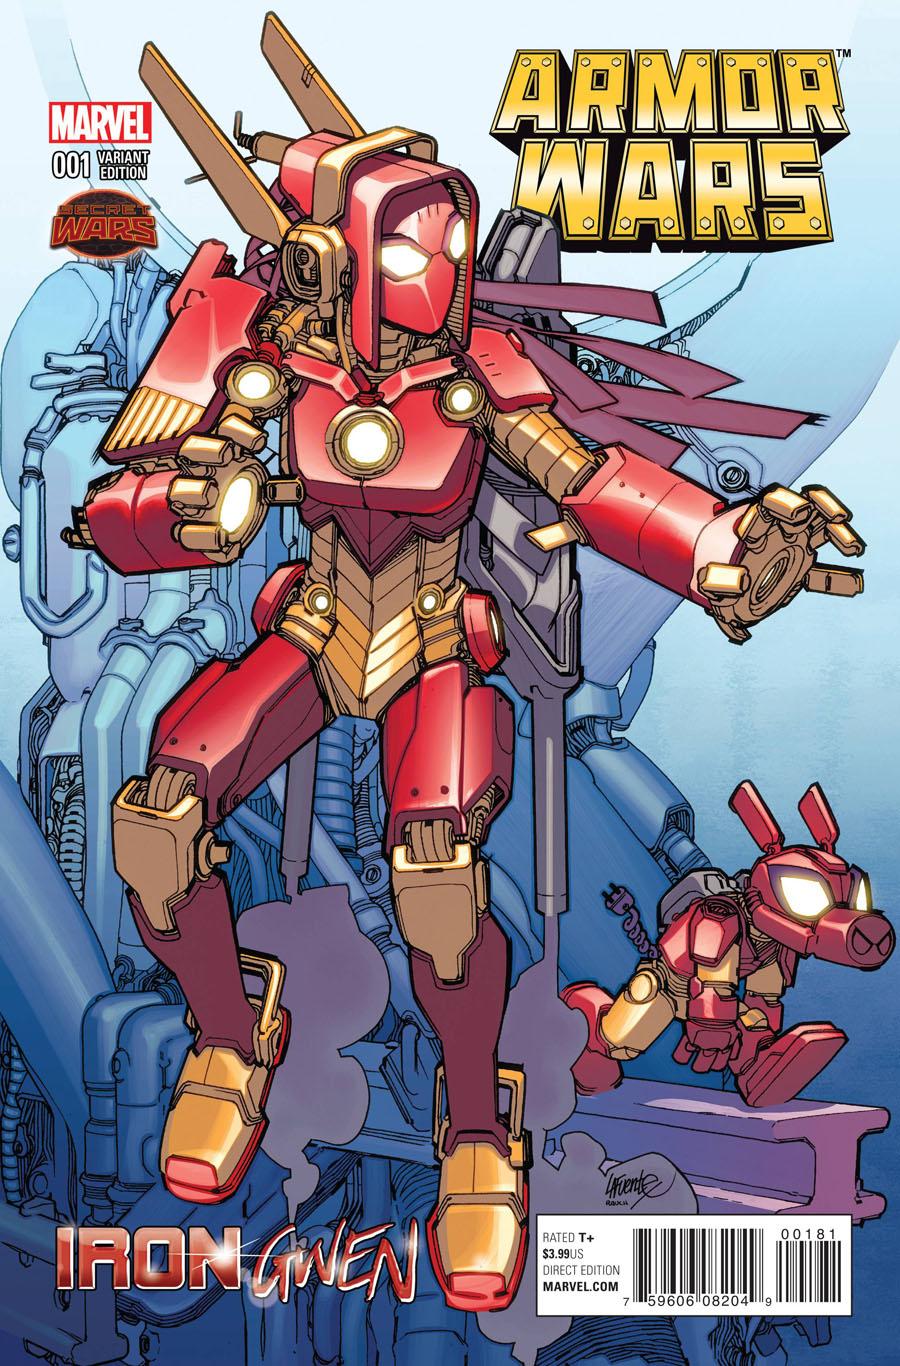 Armor Wars #1 Cover C Variant David Lafuente Iron Gwen Cover (Secret Wars Warzones Tie-In)